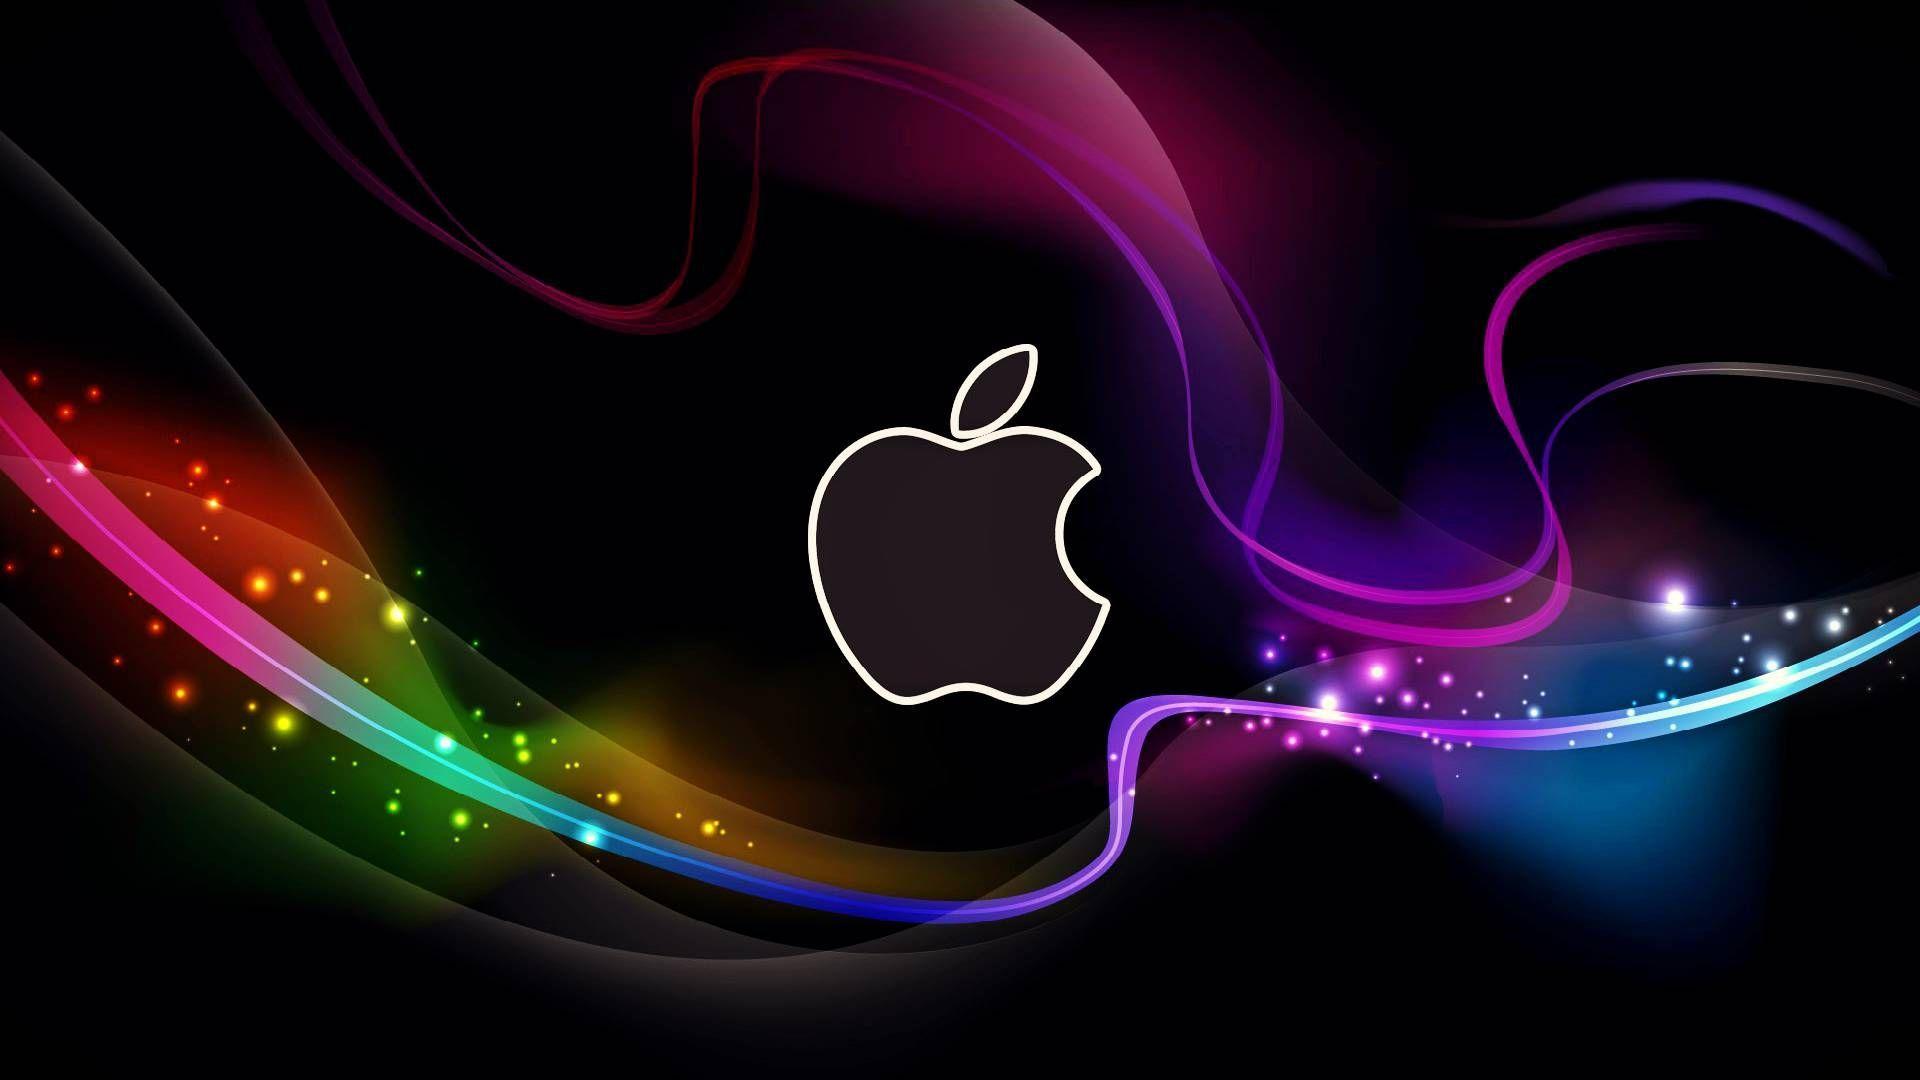 Cool Apple Wallpaper design Ideas